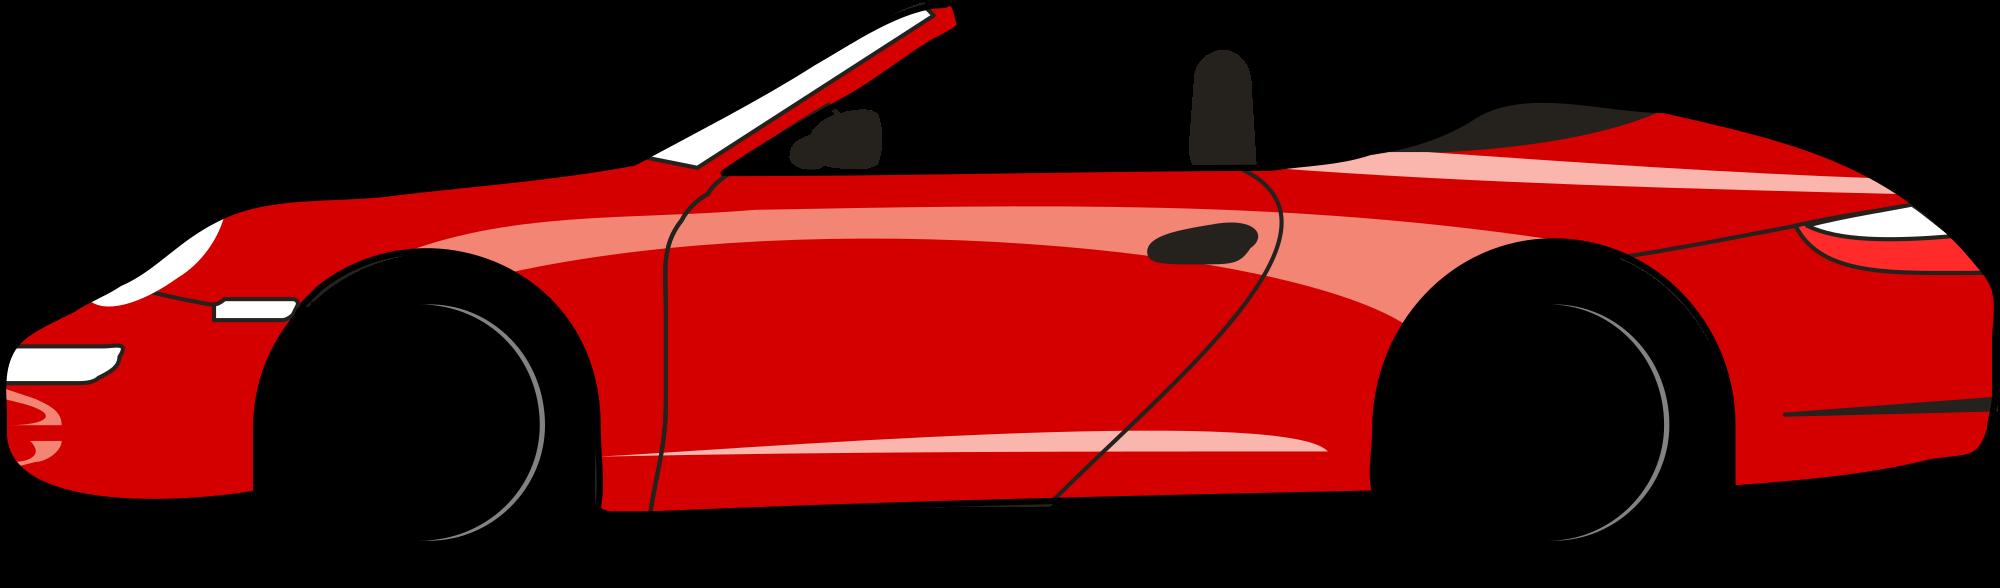 Car clipart vector png - ClipArt Best - ClipArt Best